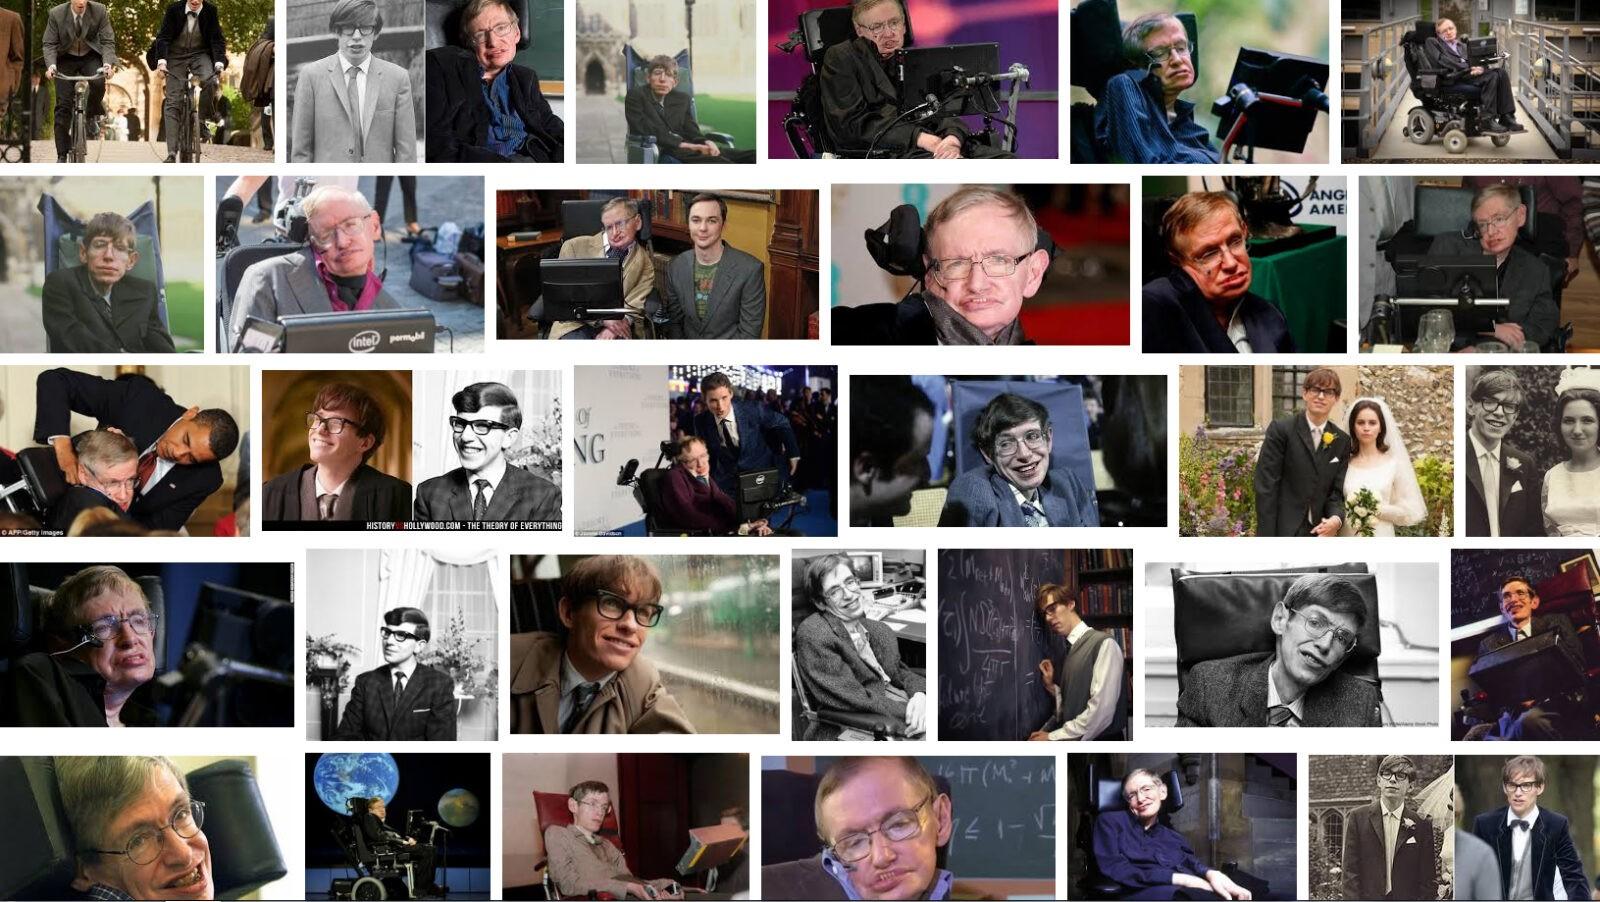 Stephen Hawking,Stephen Hawking kimdir,Stephen Hawking biyografi,Stephen Hawking hayatı,Stephen Hawking neden öldü,Stephen Hawking kitapları,Stephen Hawking teorileri,Stephen Hawking hakkında,Stephen Hawking ölüm yılı,Stephen Hawking ailesi,Stephen, Hawking,Hawking kimdir,Hawking hayatı,Hawking biyografi,Hawking ,stephen hawking biography,stephen hawking who is he